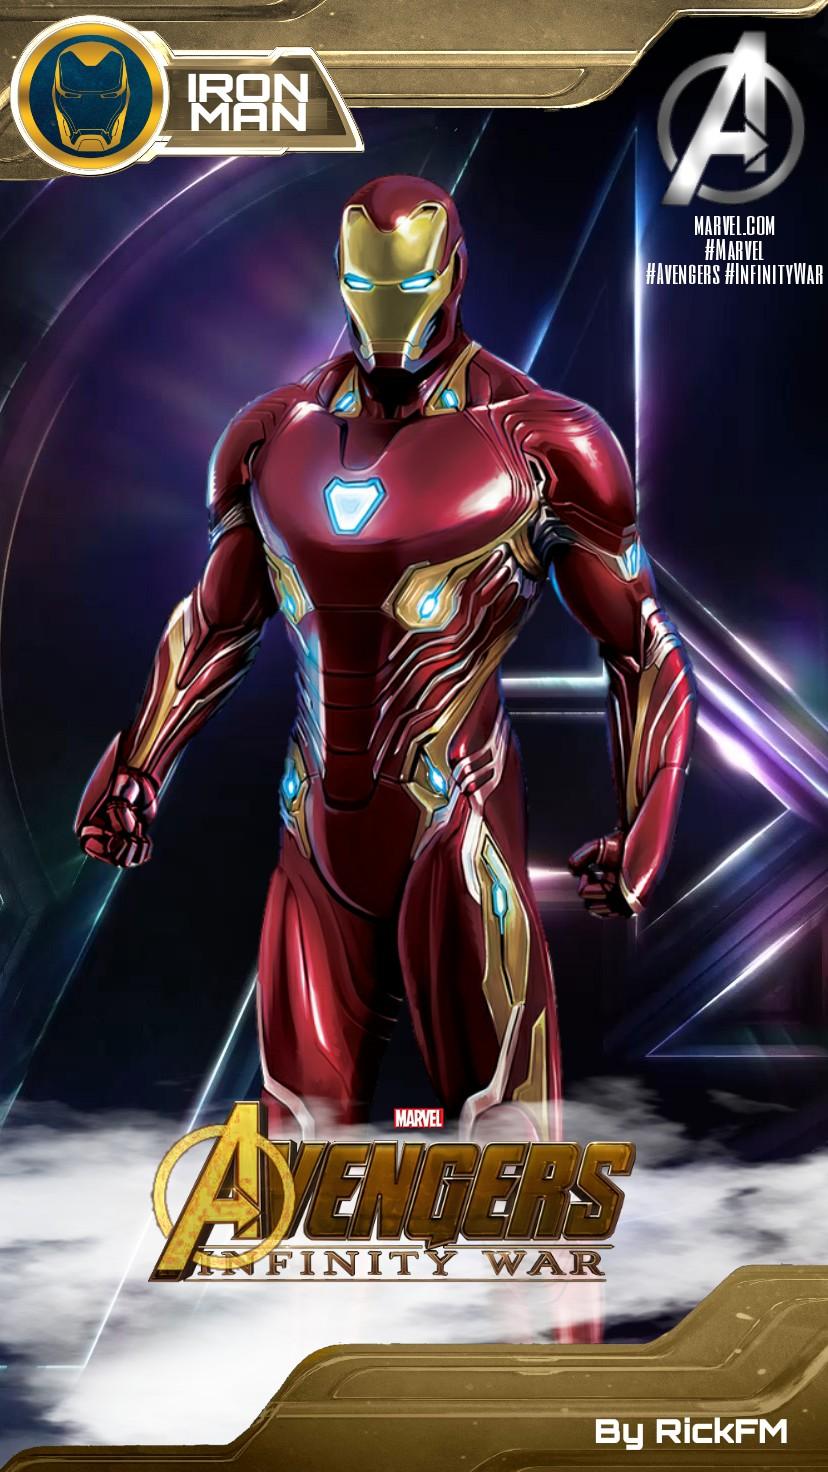 Avengers Infinity War Iron Man Mark 50 Wallpaper By Rickfm On